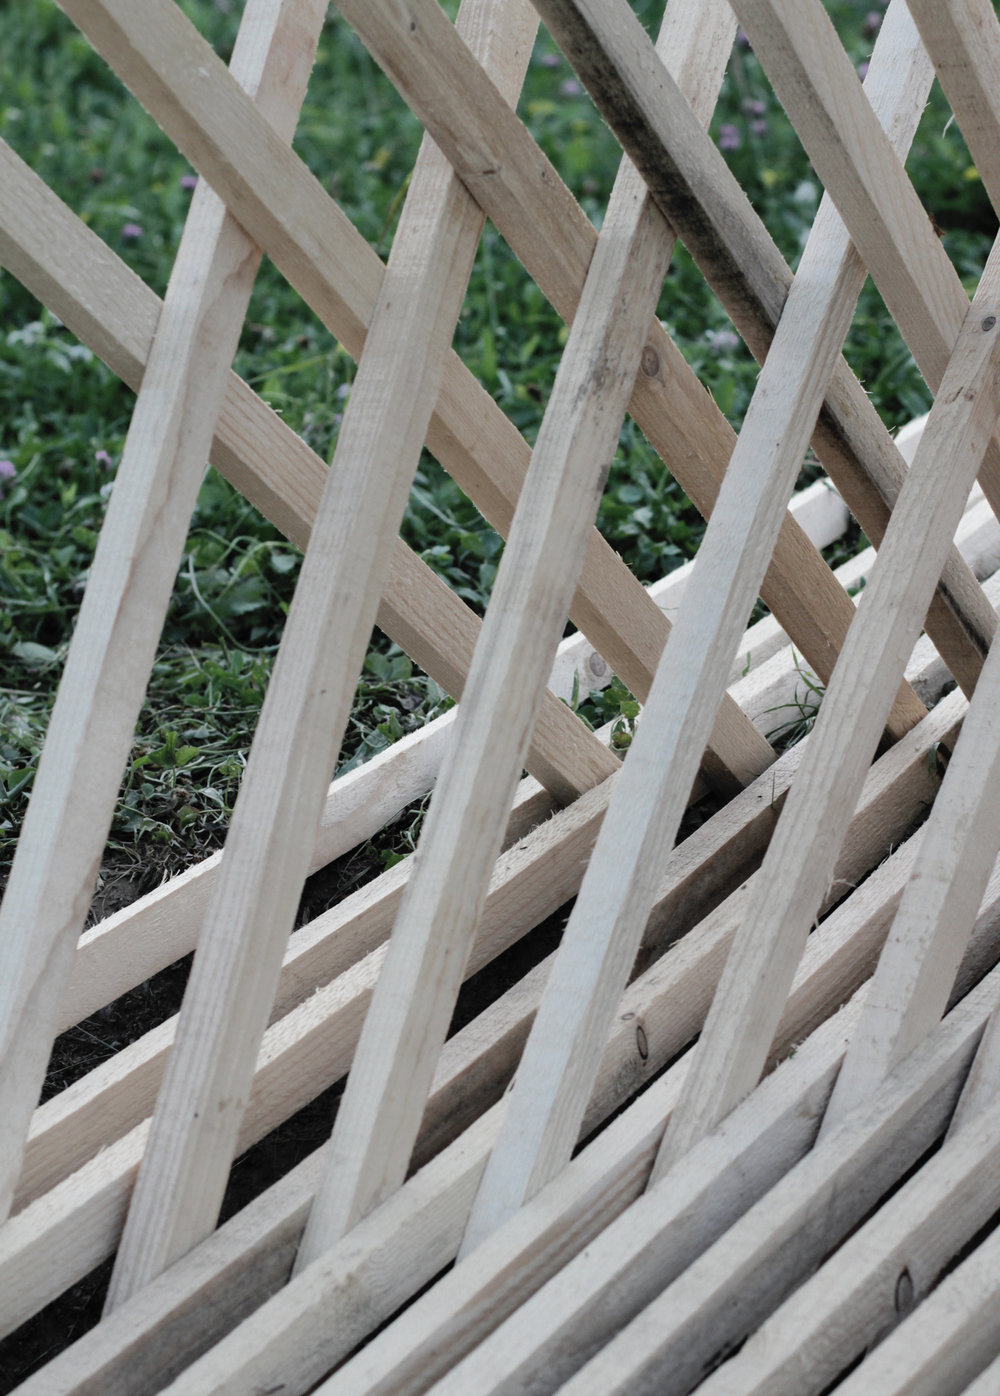 01_wooden_ferrari_foto_a_schmidt.JPG